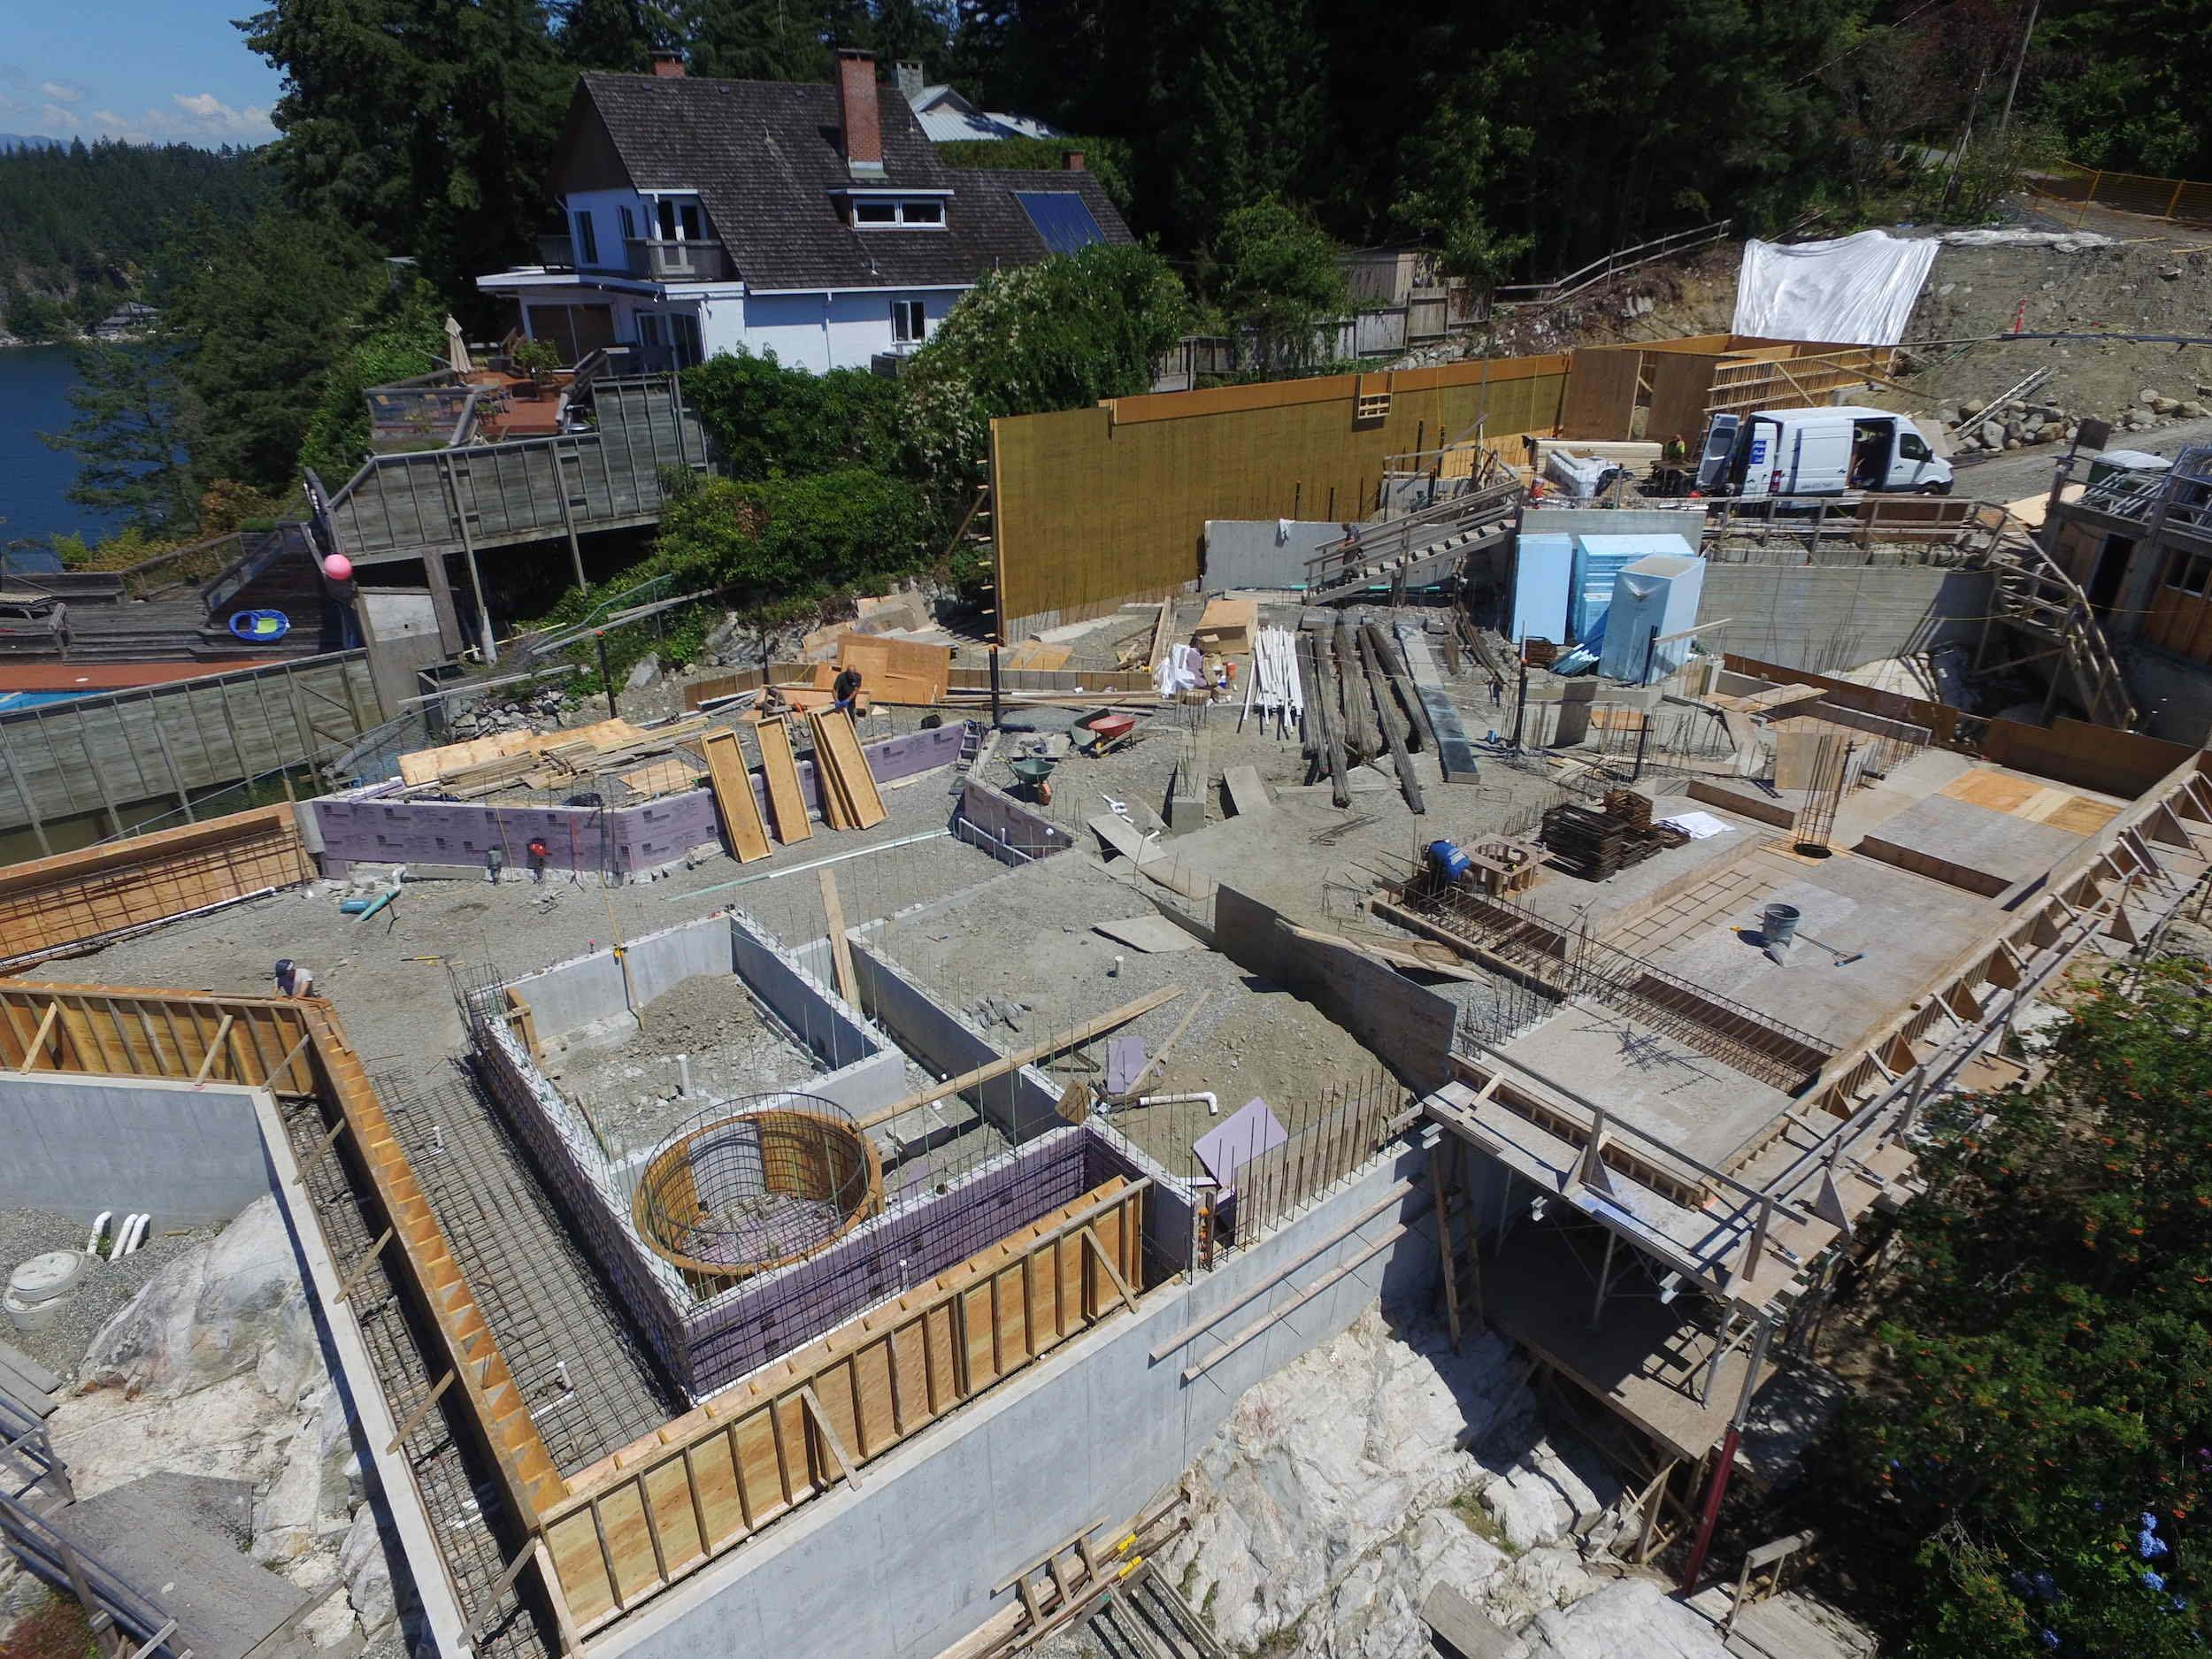 Postle_Construction_ConcreteForming2.jpg